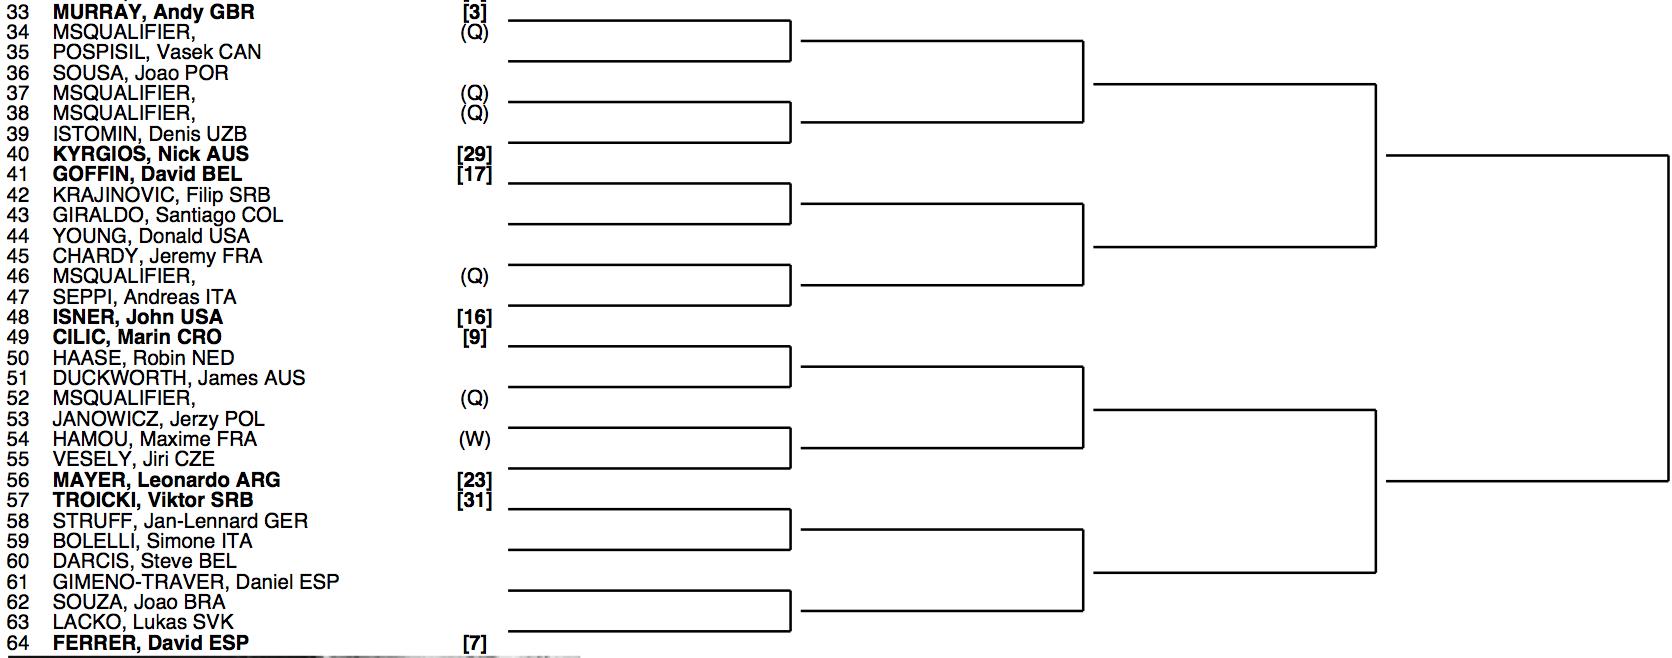 Roland Garros 2015 Draw 2:4